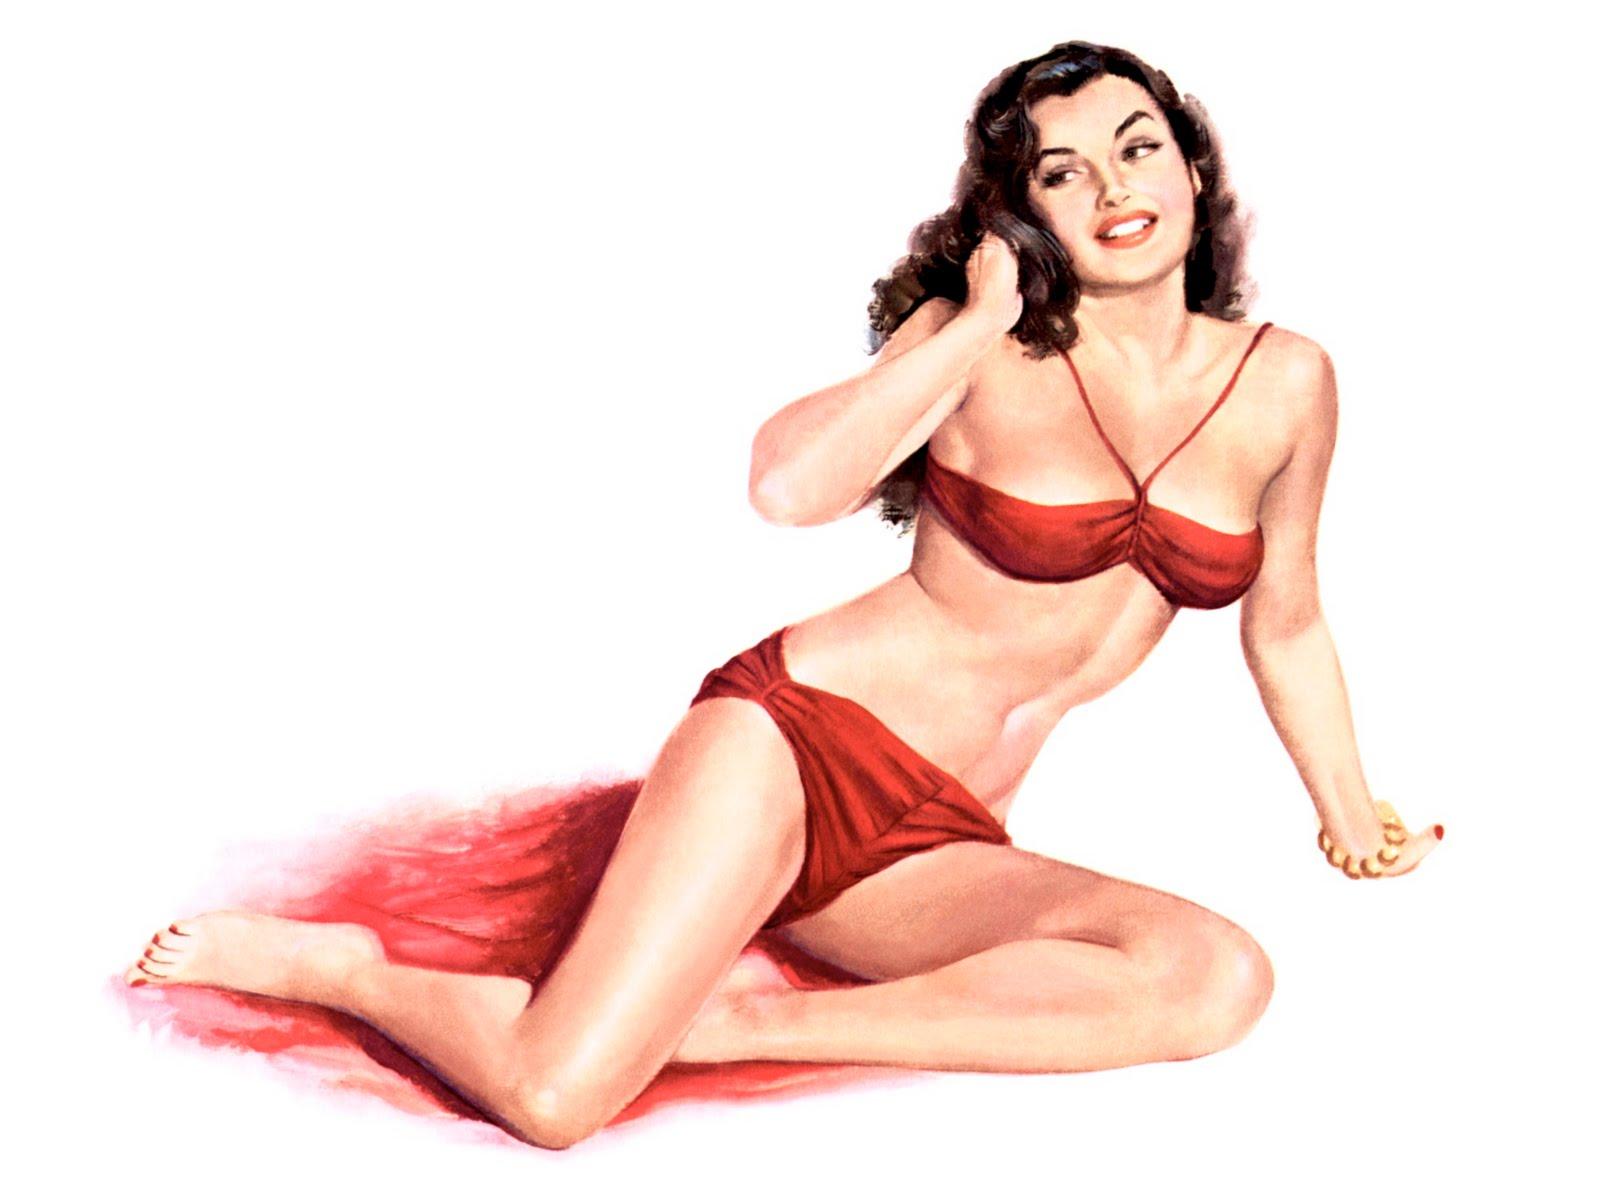 Bikini Xavia-Brooke Timothy nude (35 photos), Topless, Fappening, Twitter, cameltoe 2006